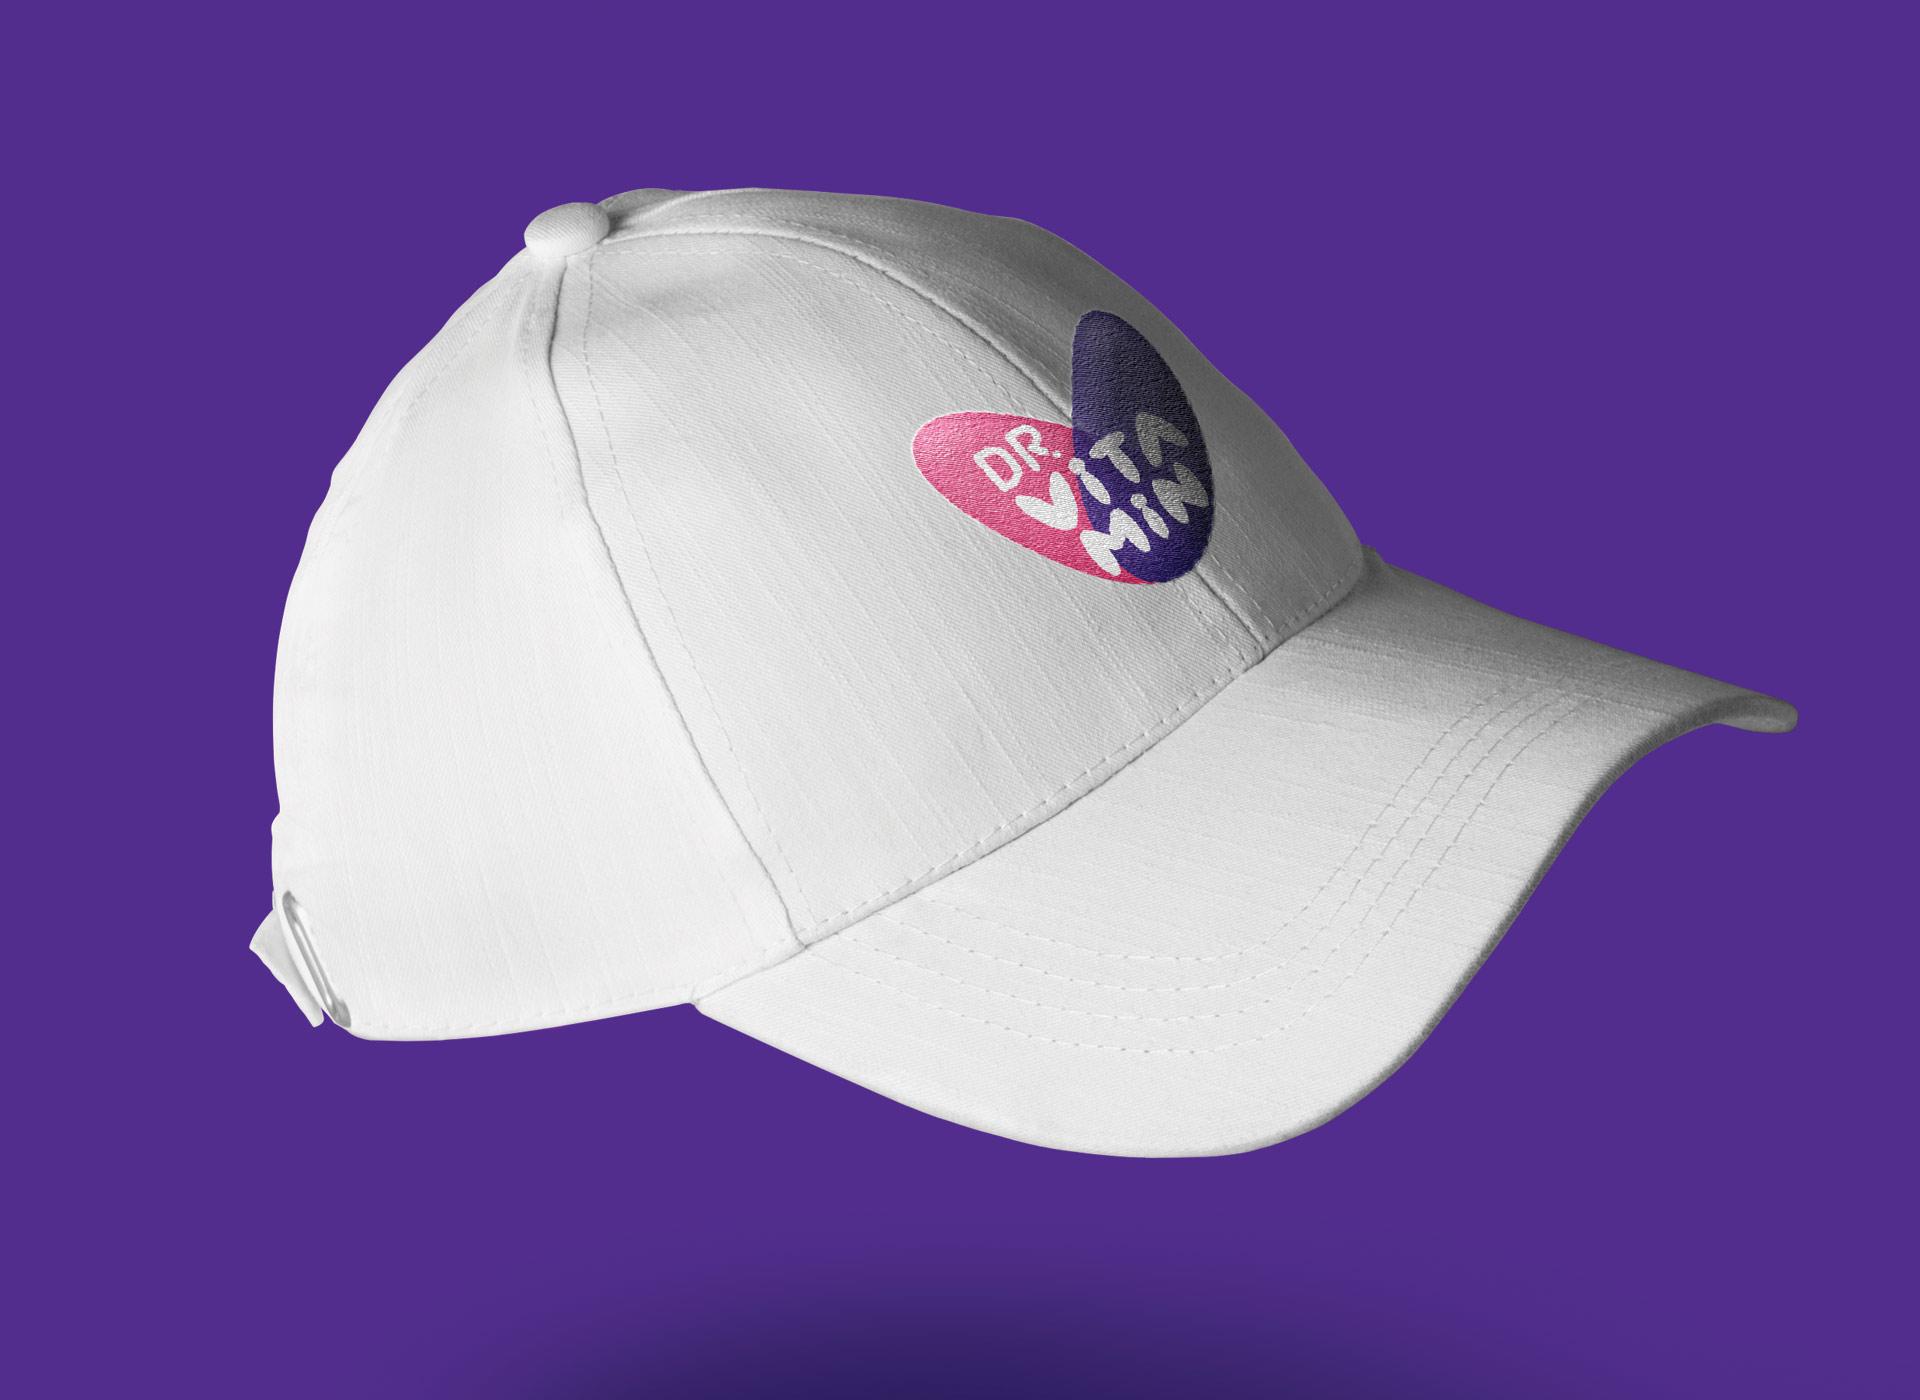 doctor vitamin cap inoveo branding